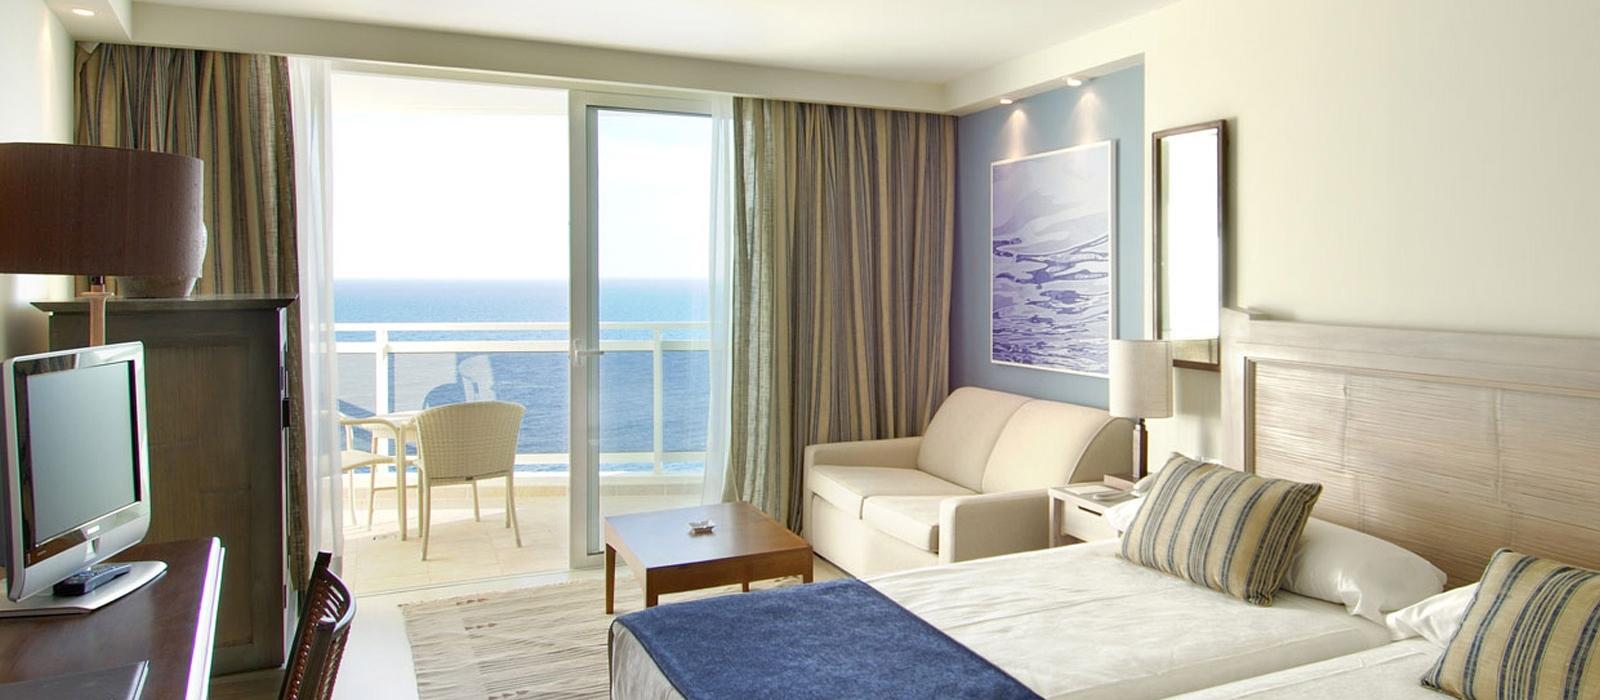 Chambres Hôtel Vincci Tenerife Golf - Chambre Doubles Superior